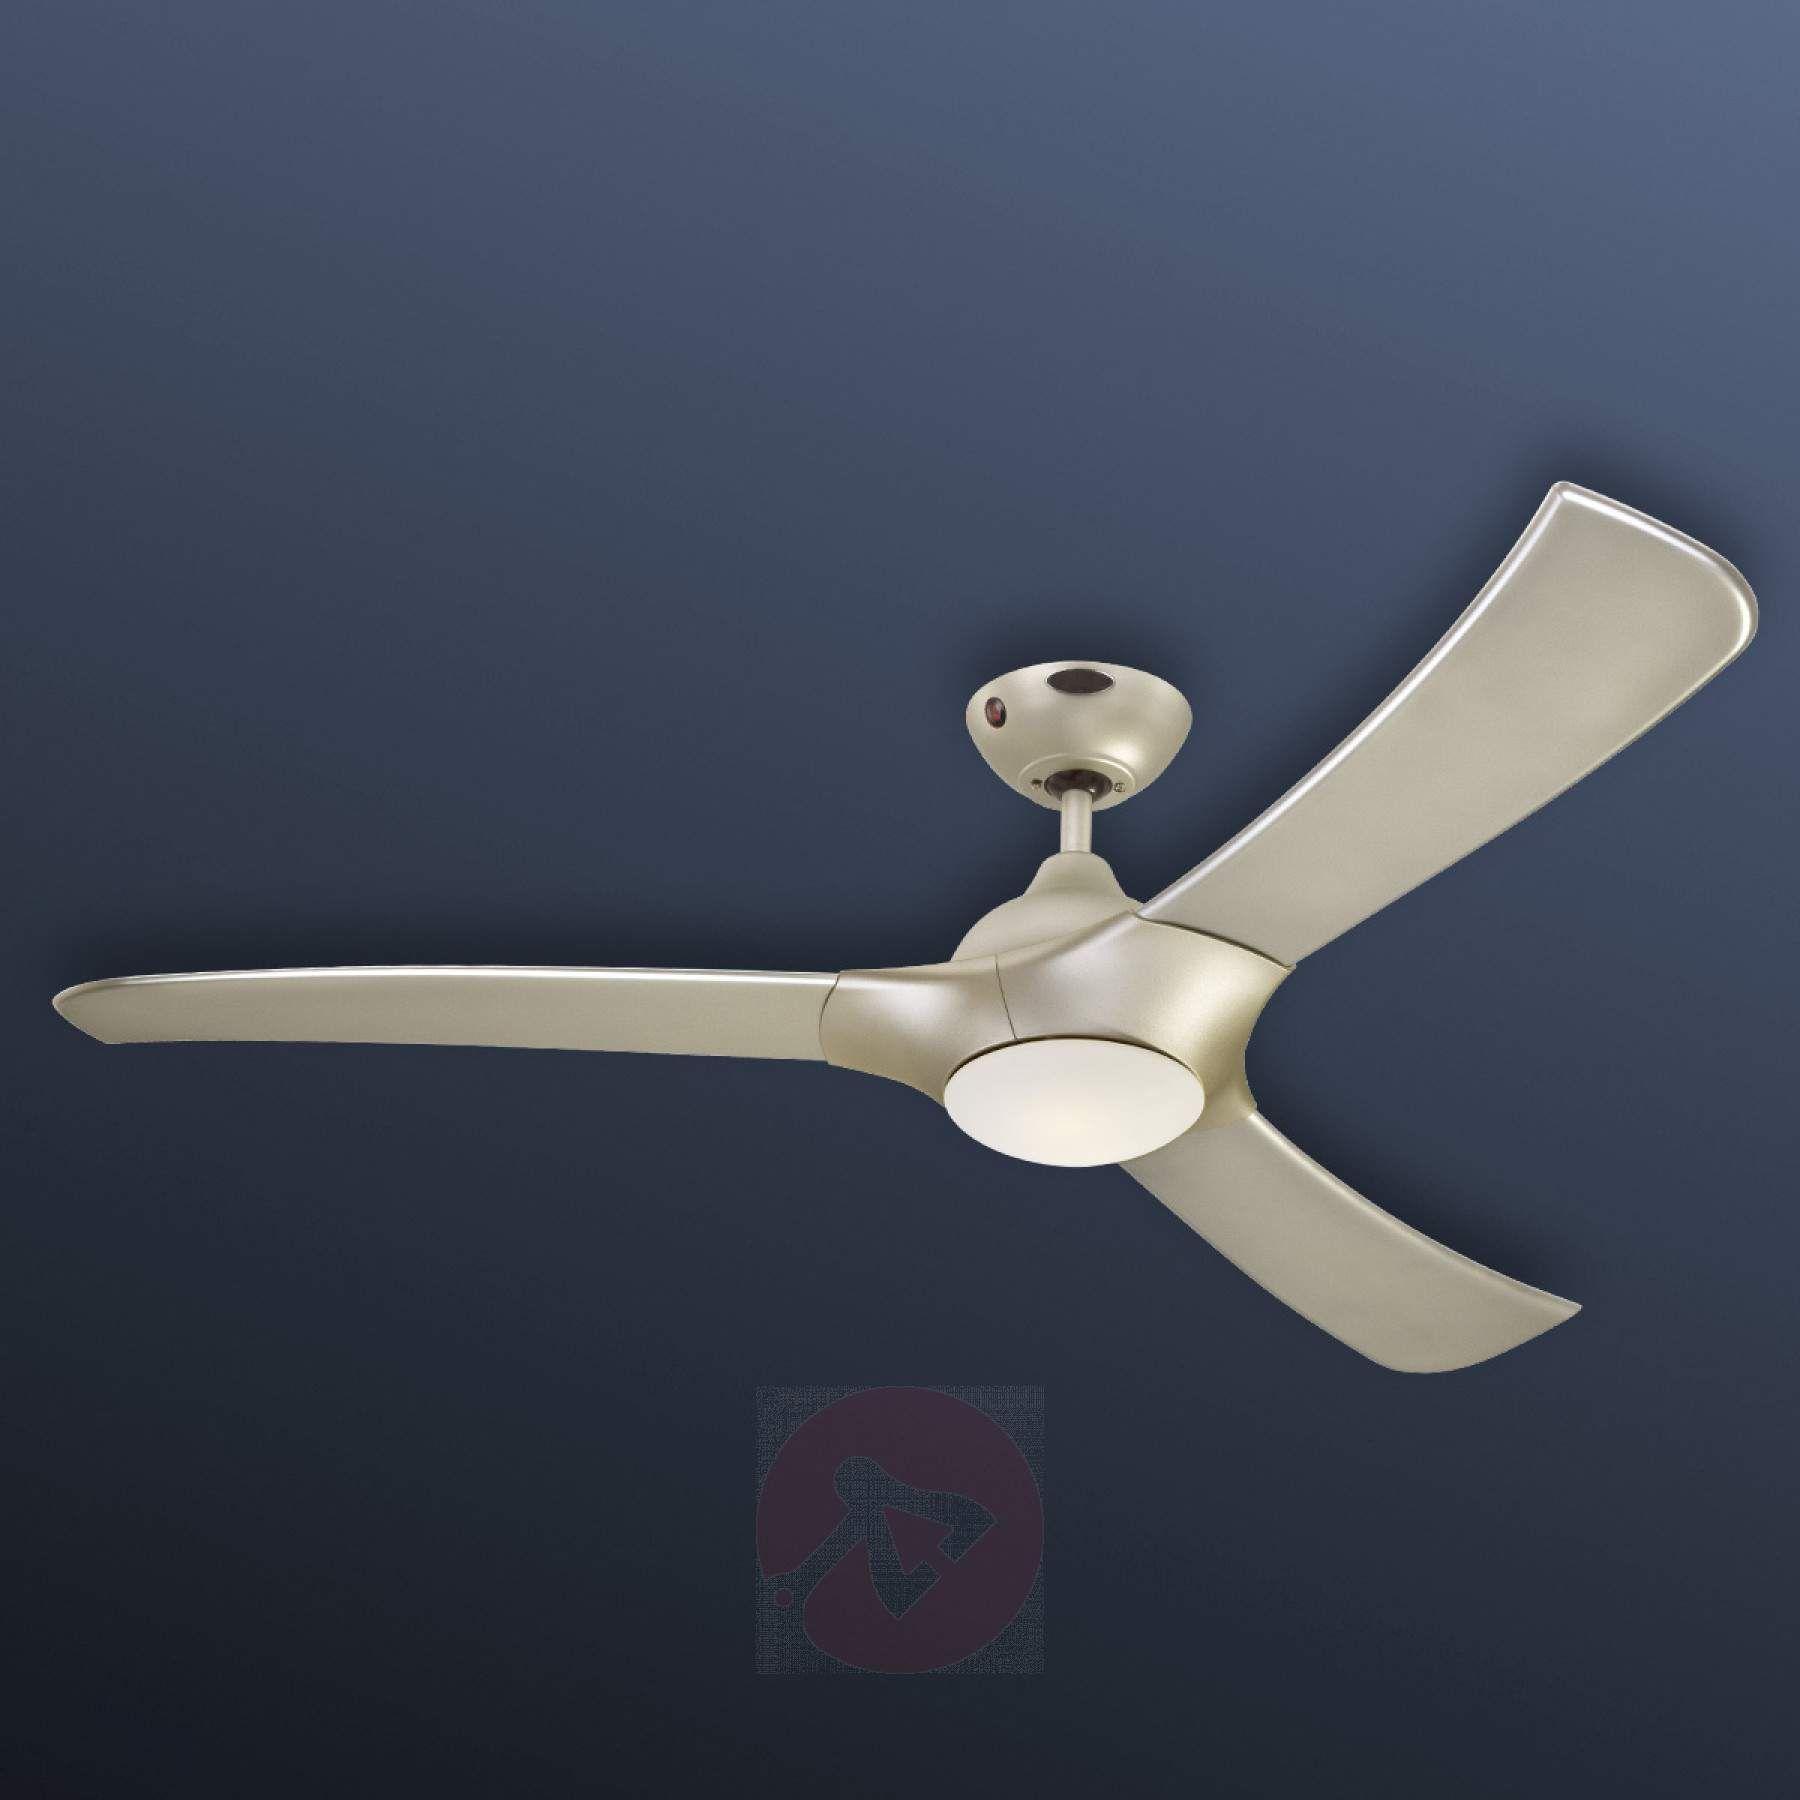 Westinghouse Techno Titanfarbener Ventilator Techno Westinghouse Ceiling Fan